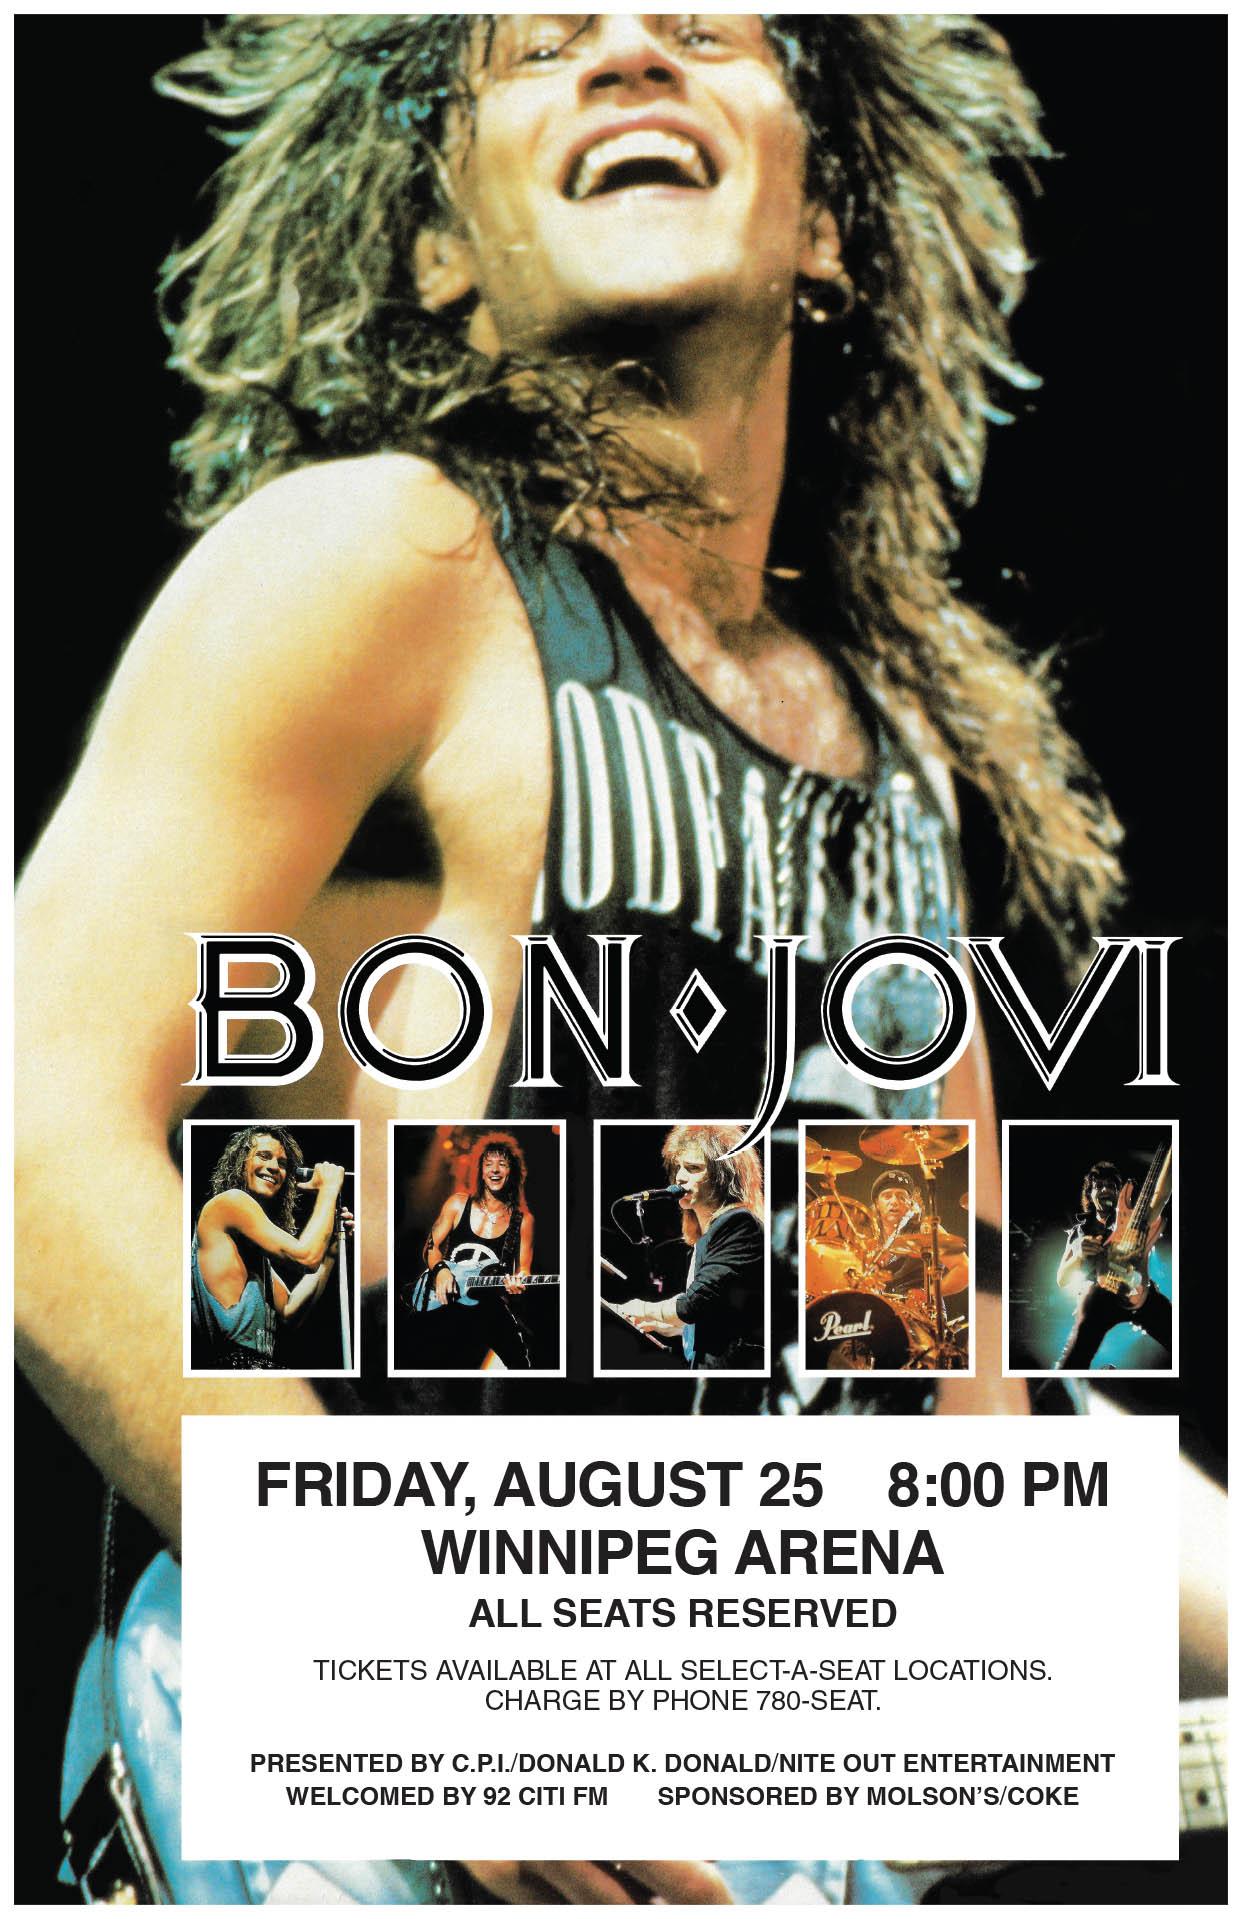 BON JOVI – 1989